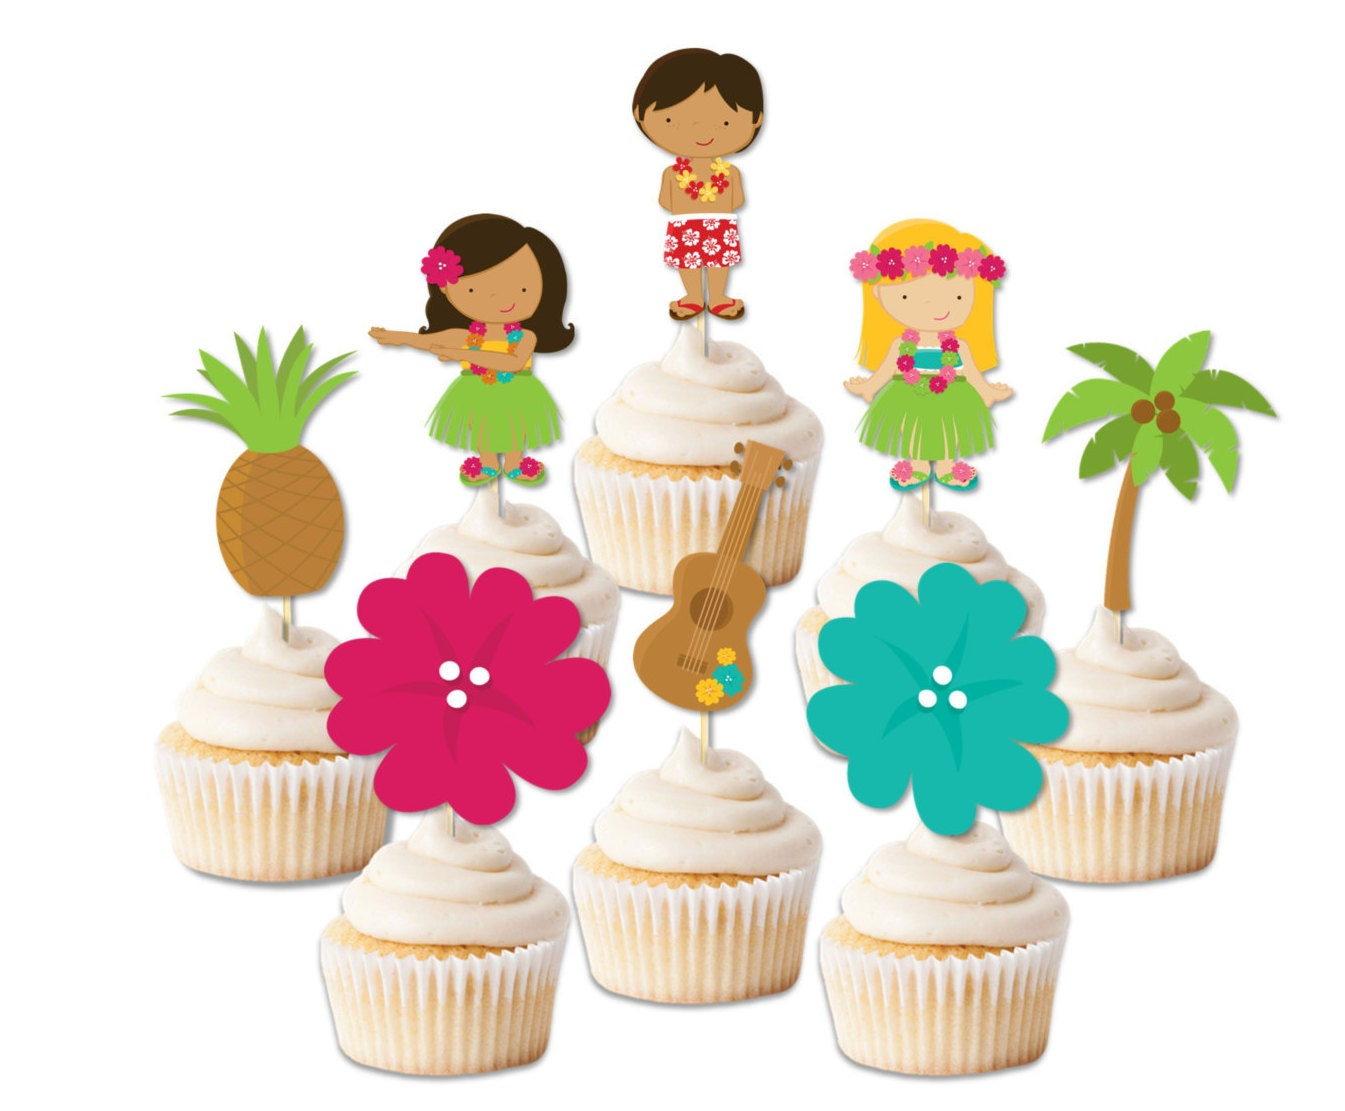 luau cupcake toppers luau party decor luau party toppers hawaii party luau - Luau Decorations